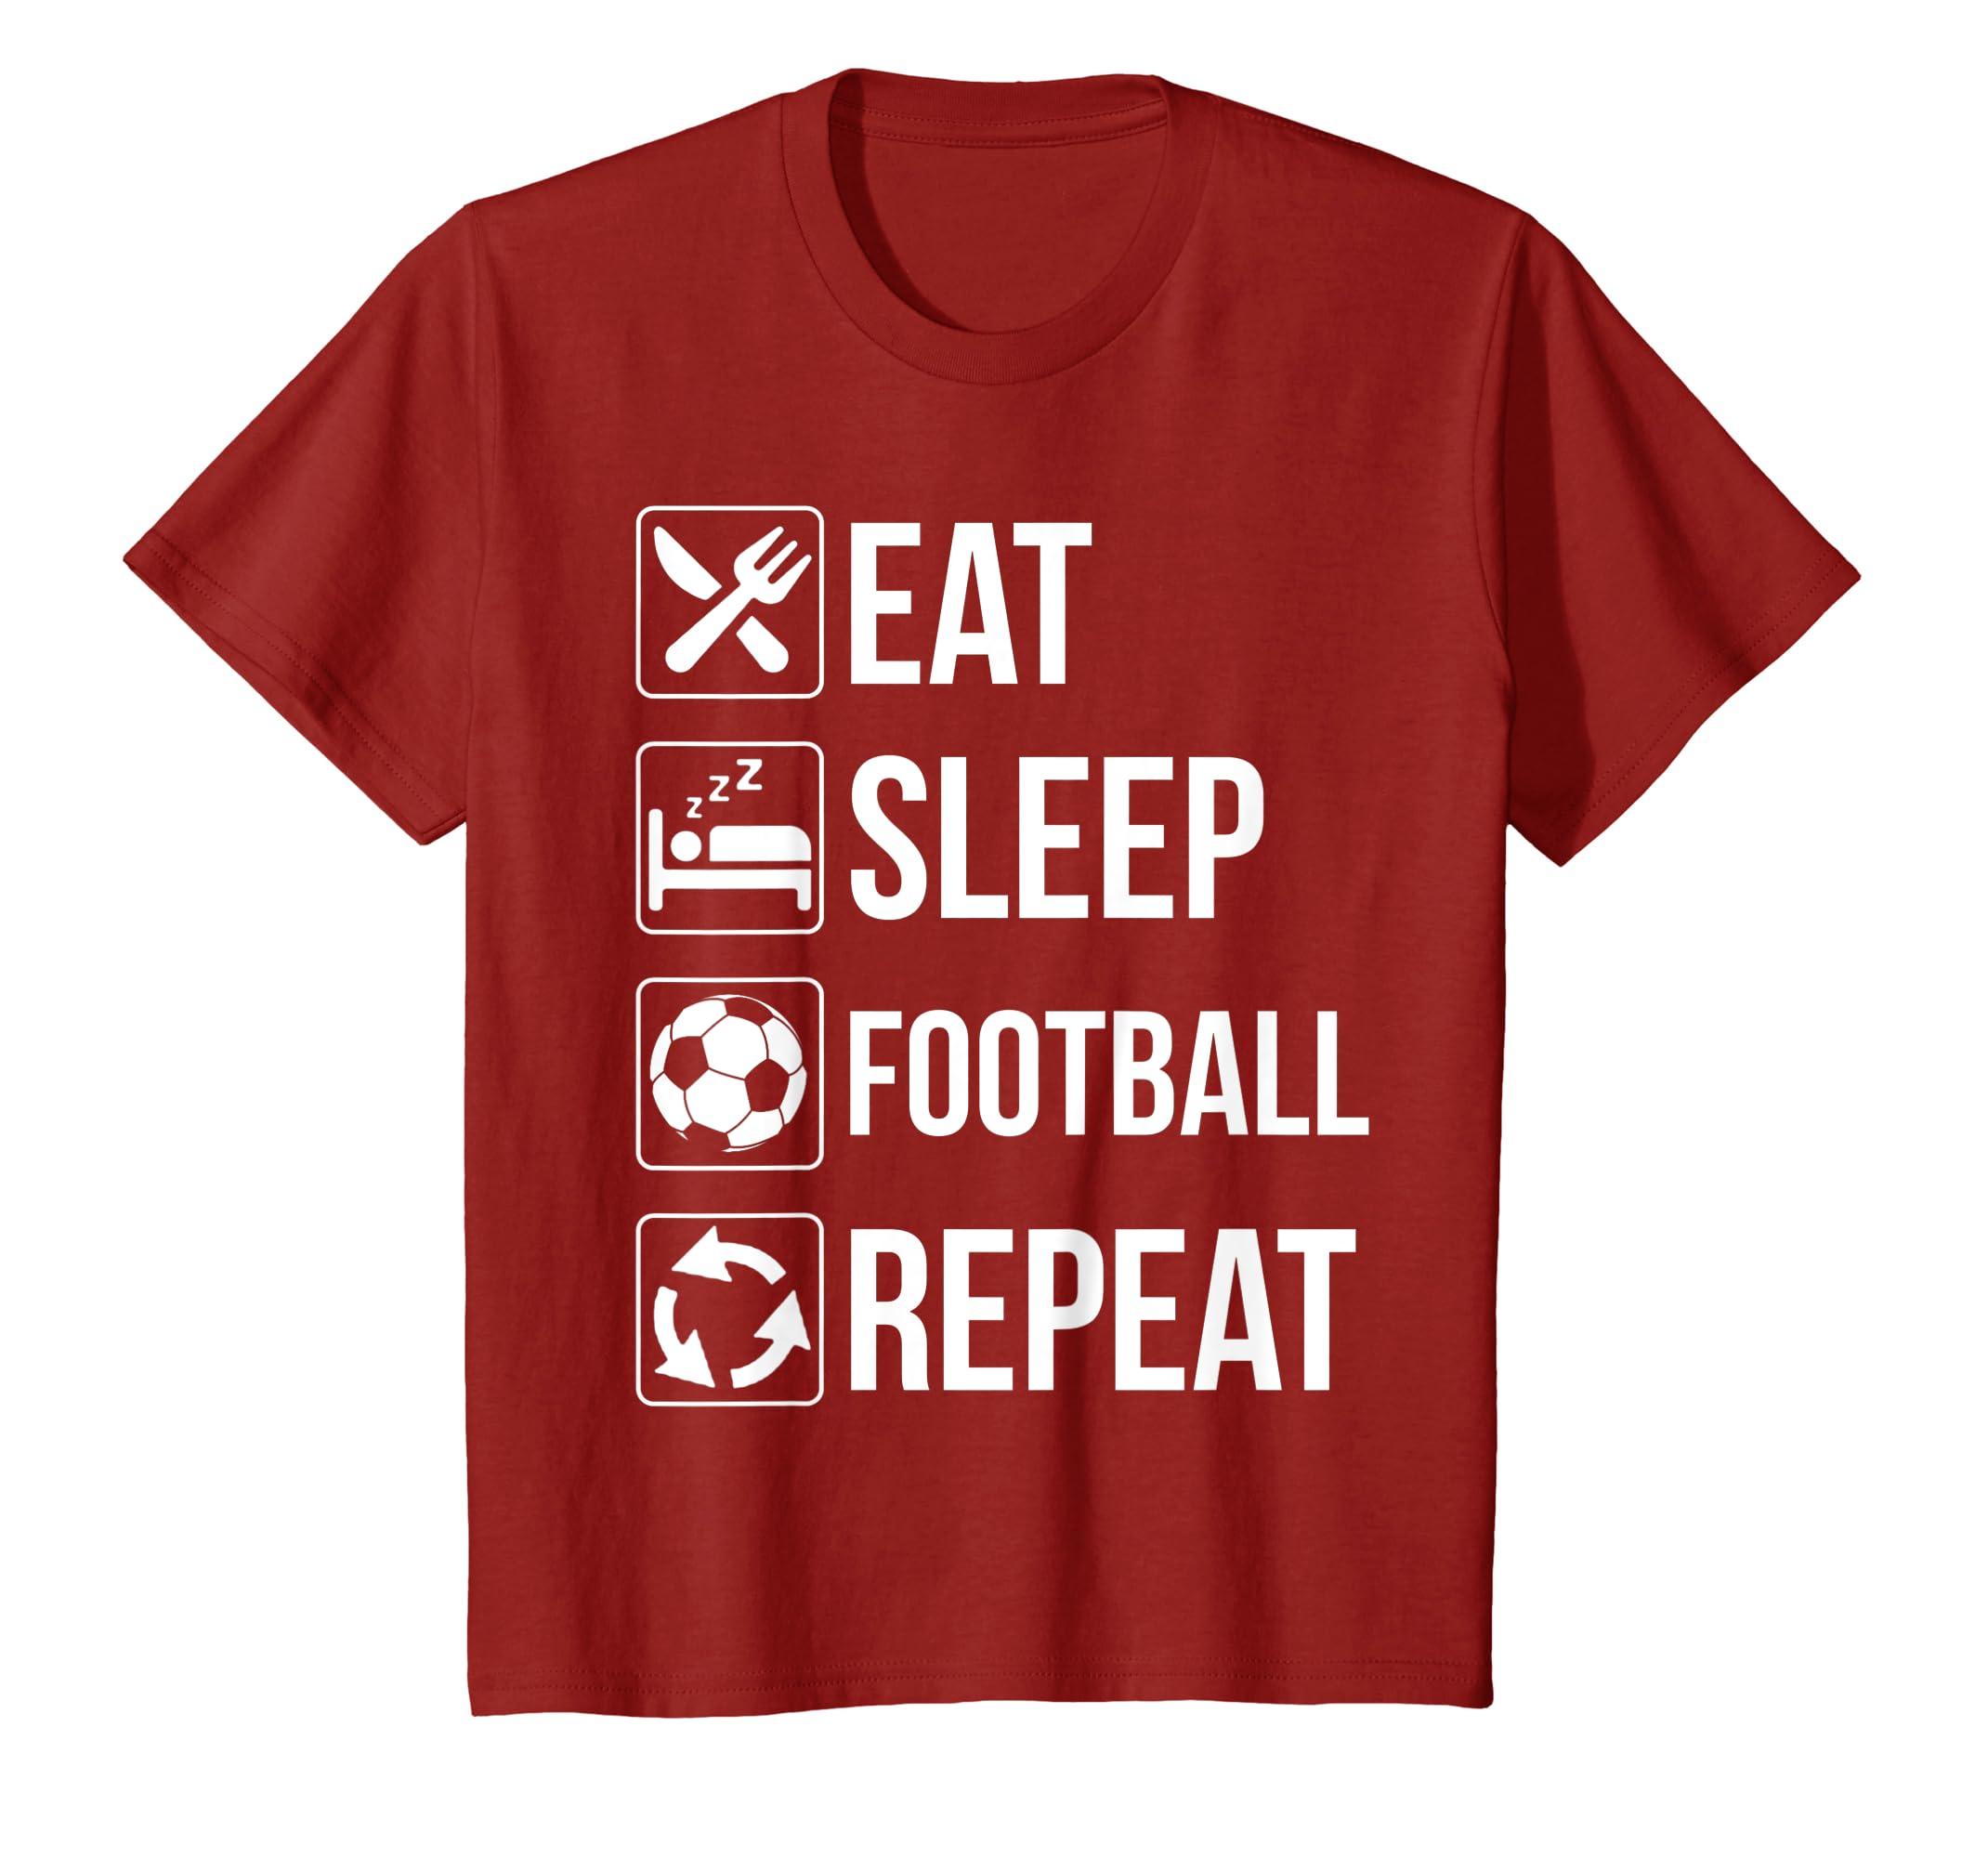 29d334711 Amazon.com: Eat Sleep Football Repeat T Shirt Funny Gift Soccer PLayers:  Clothing